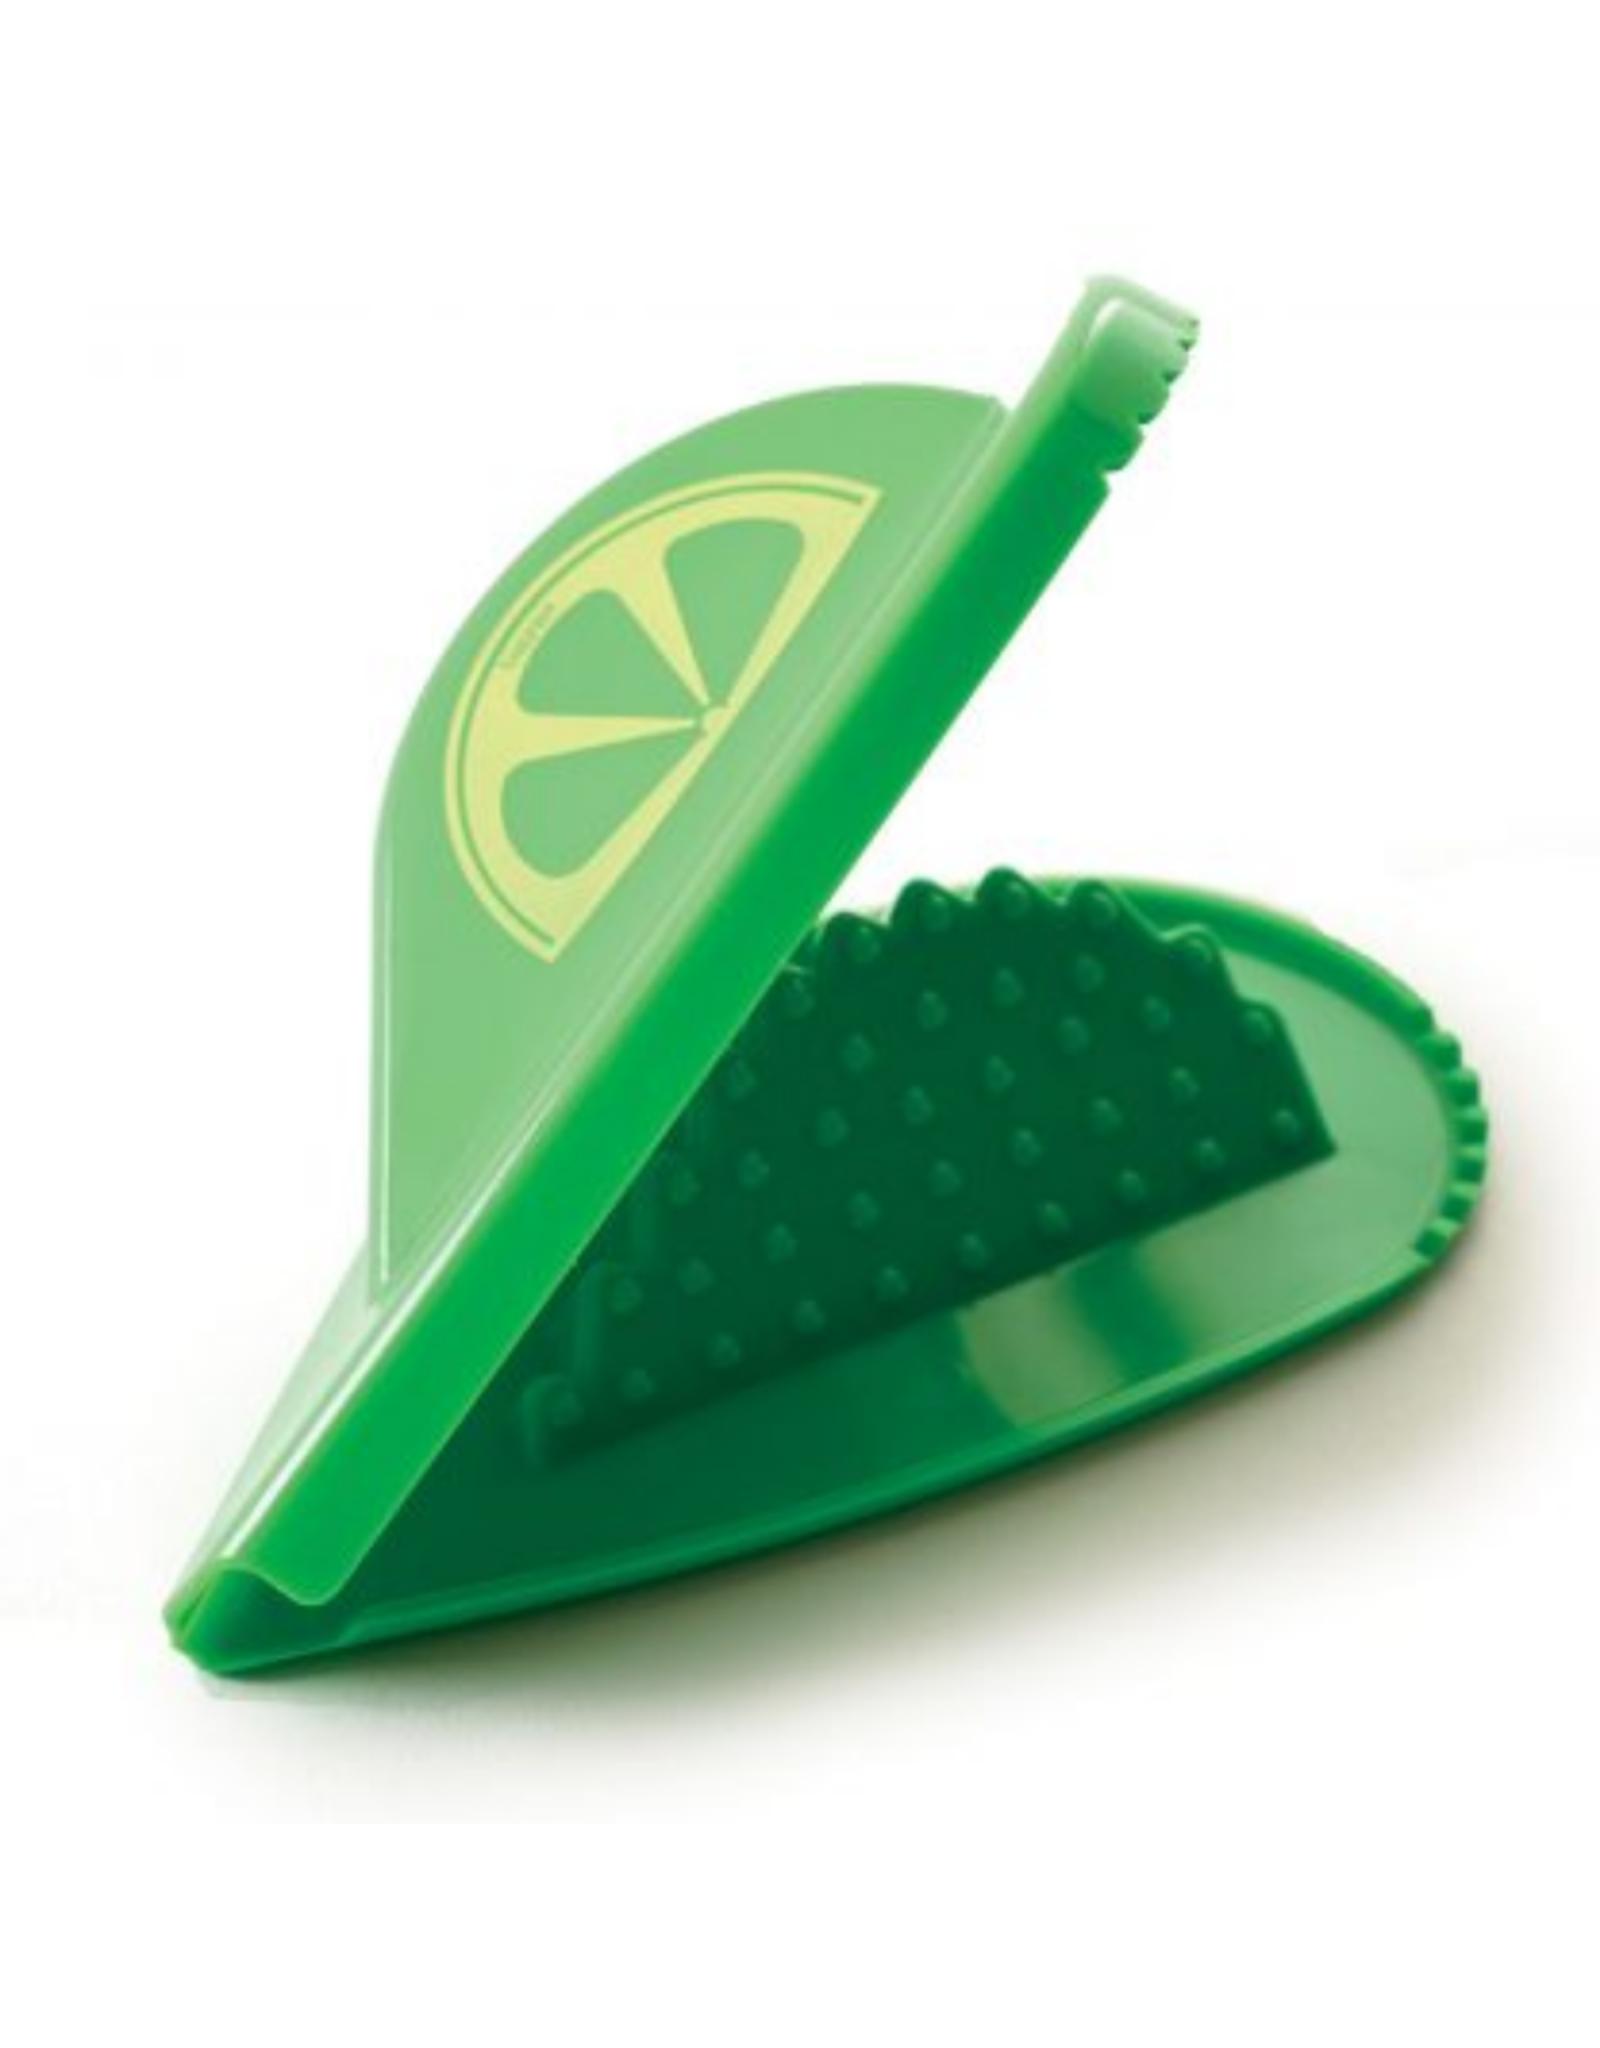 Norpro Presse-agrumes en plastique Norpro - vert